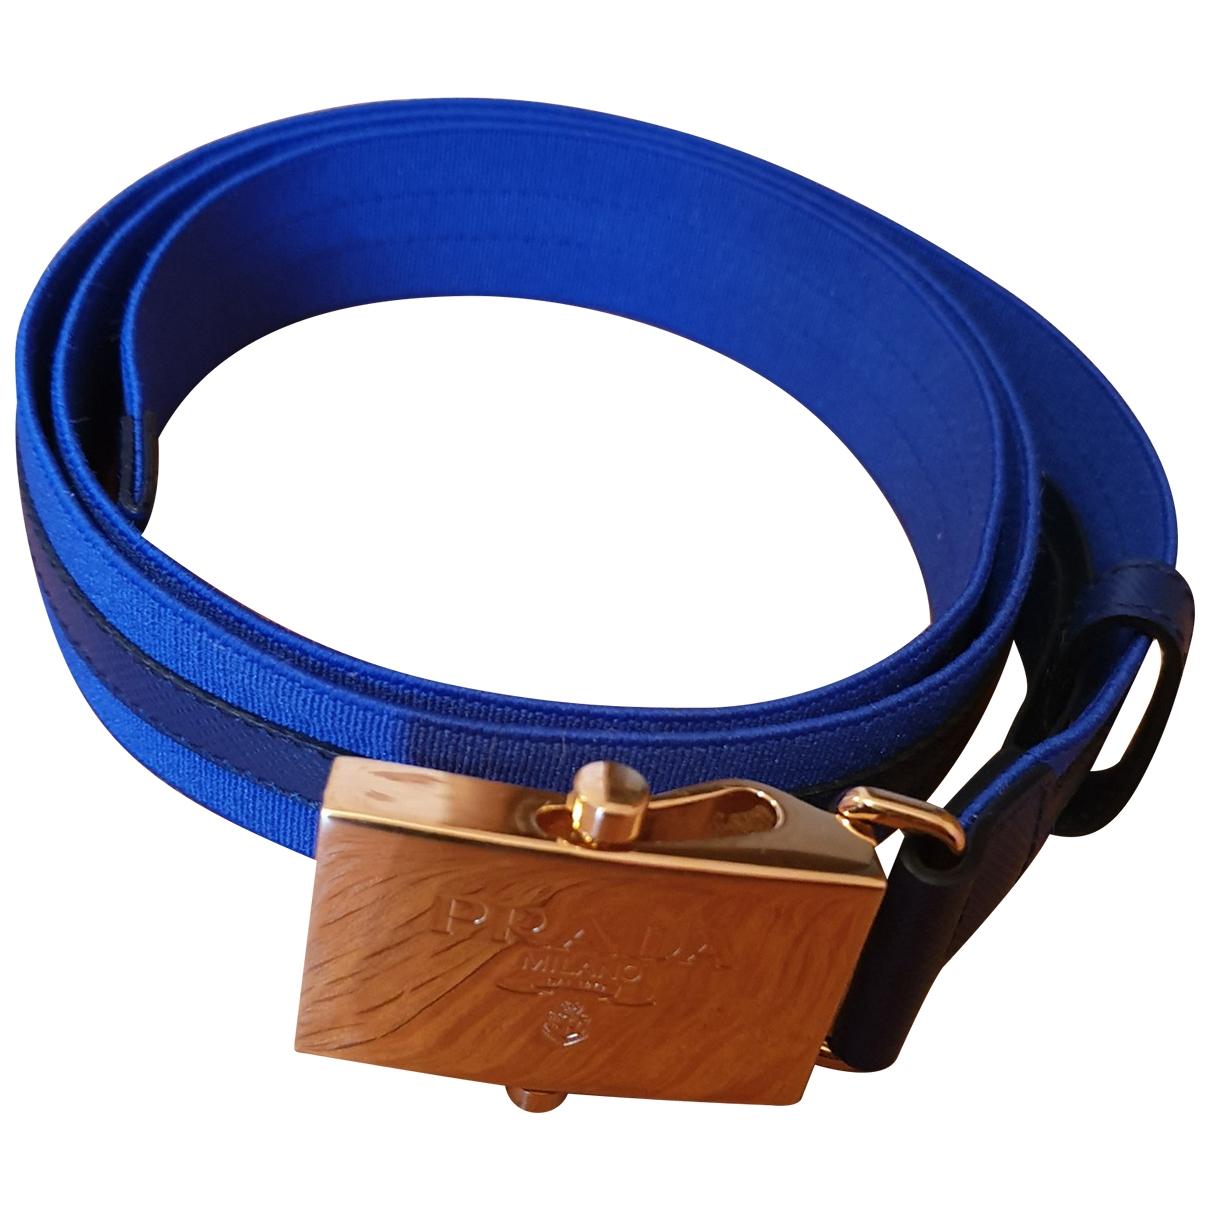 Prada \N Blue Cloth belt for Women S International